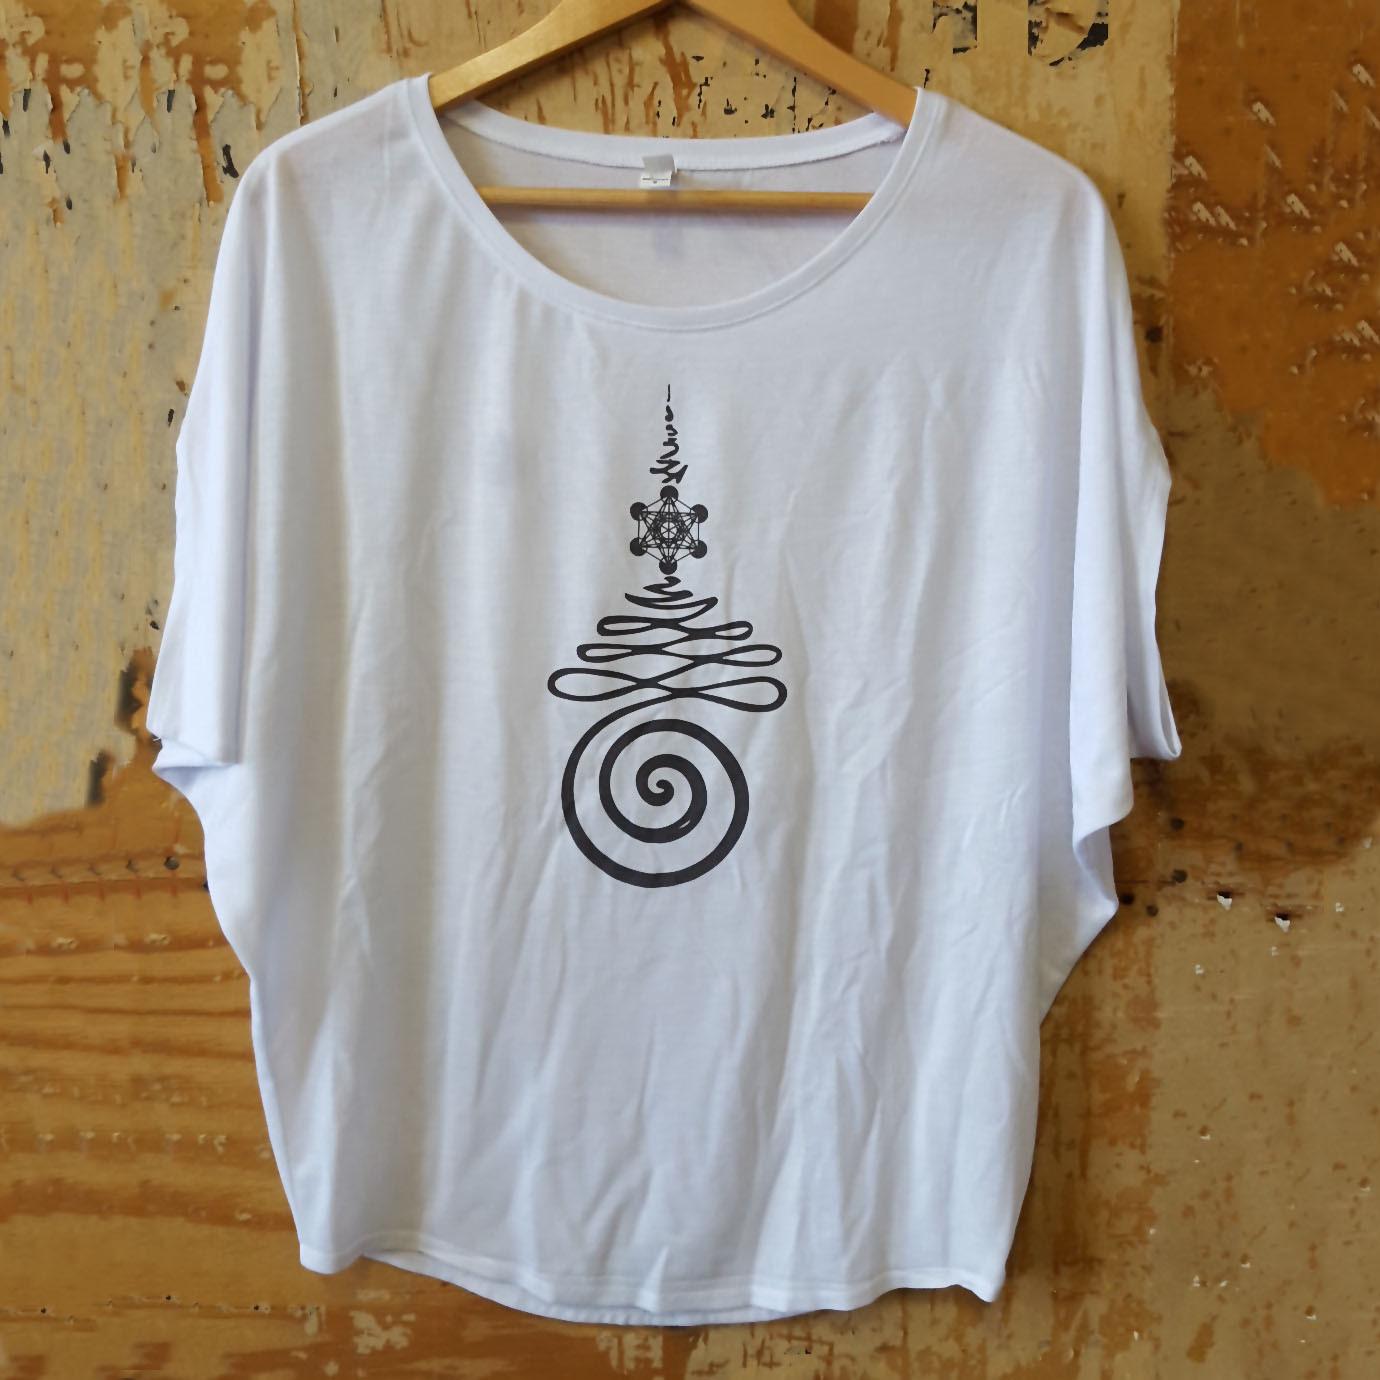 Men Printed T-shirts - WE Fashion 72